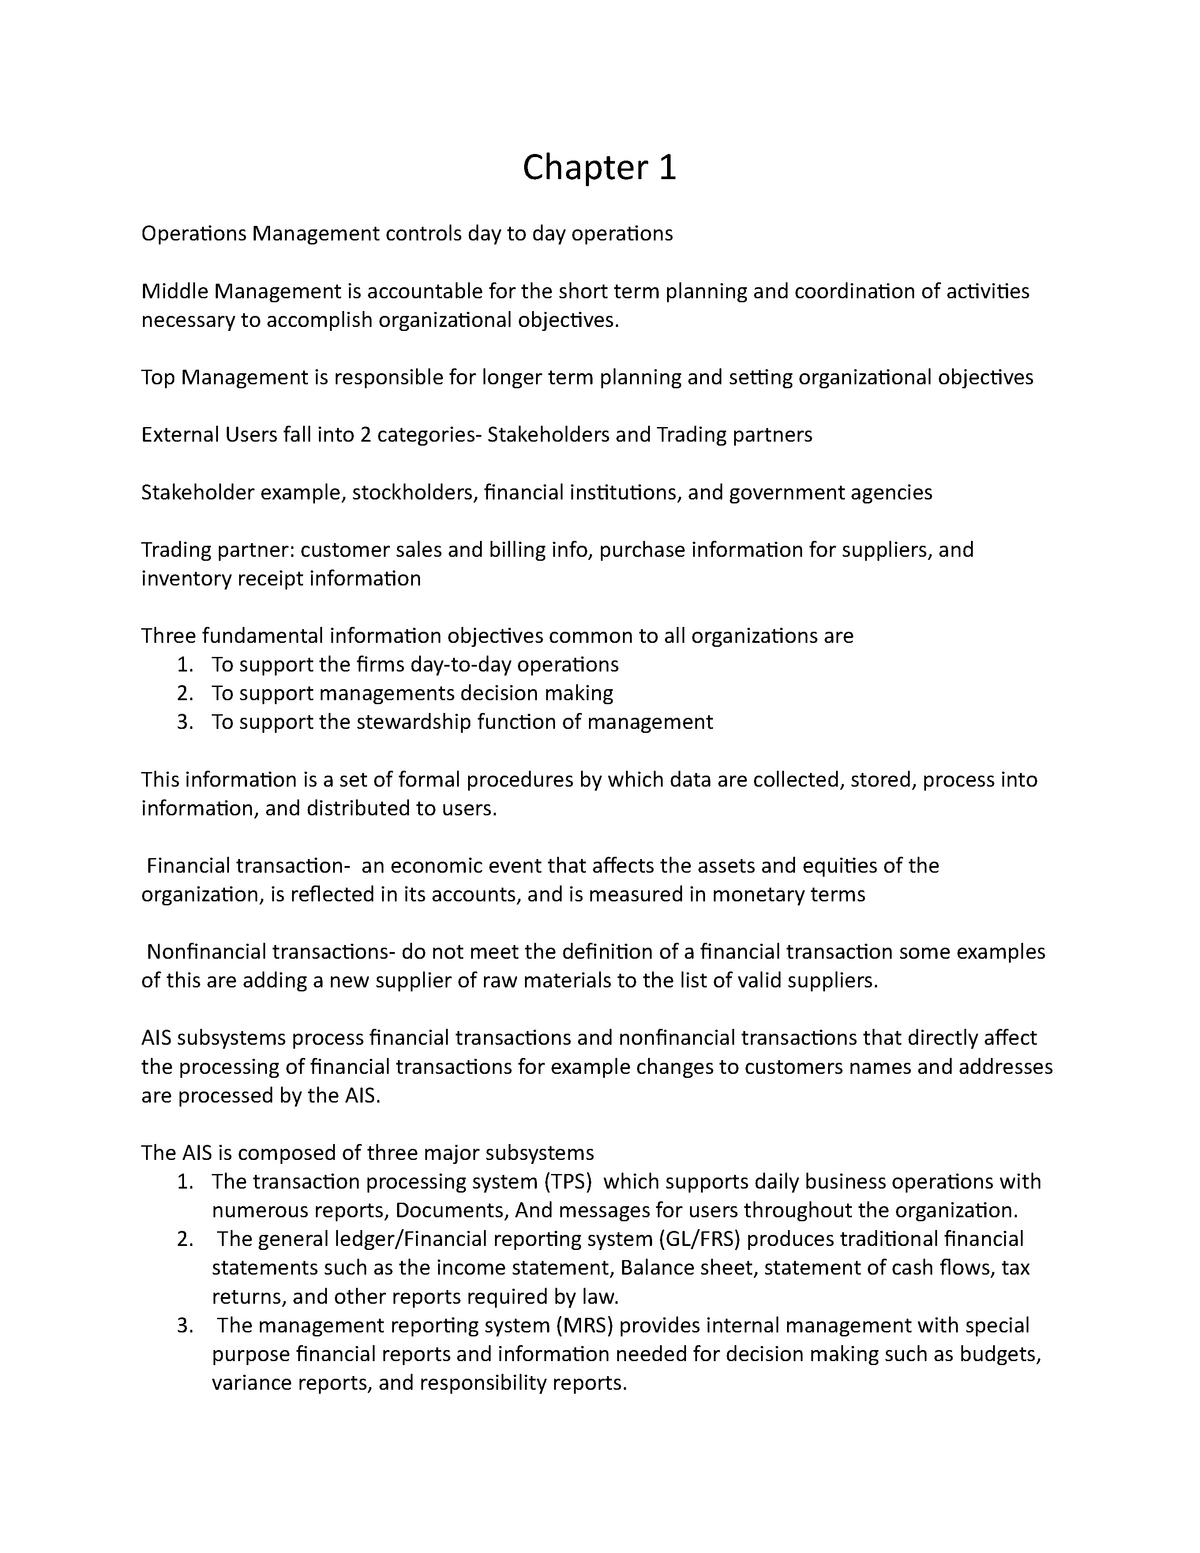 AIS exam 1 notes - ACC 300: Accounting Systems - StuDocu